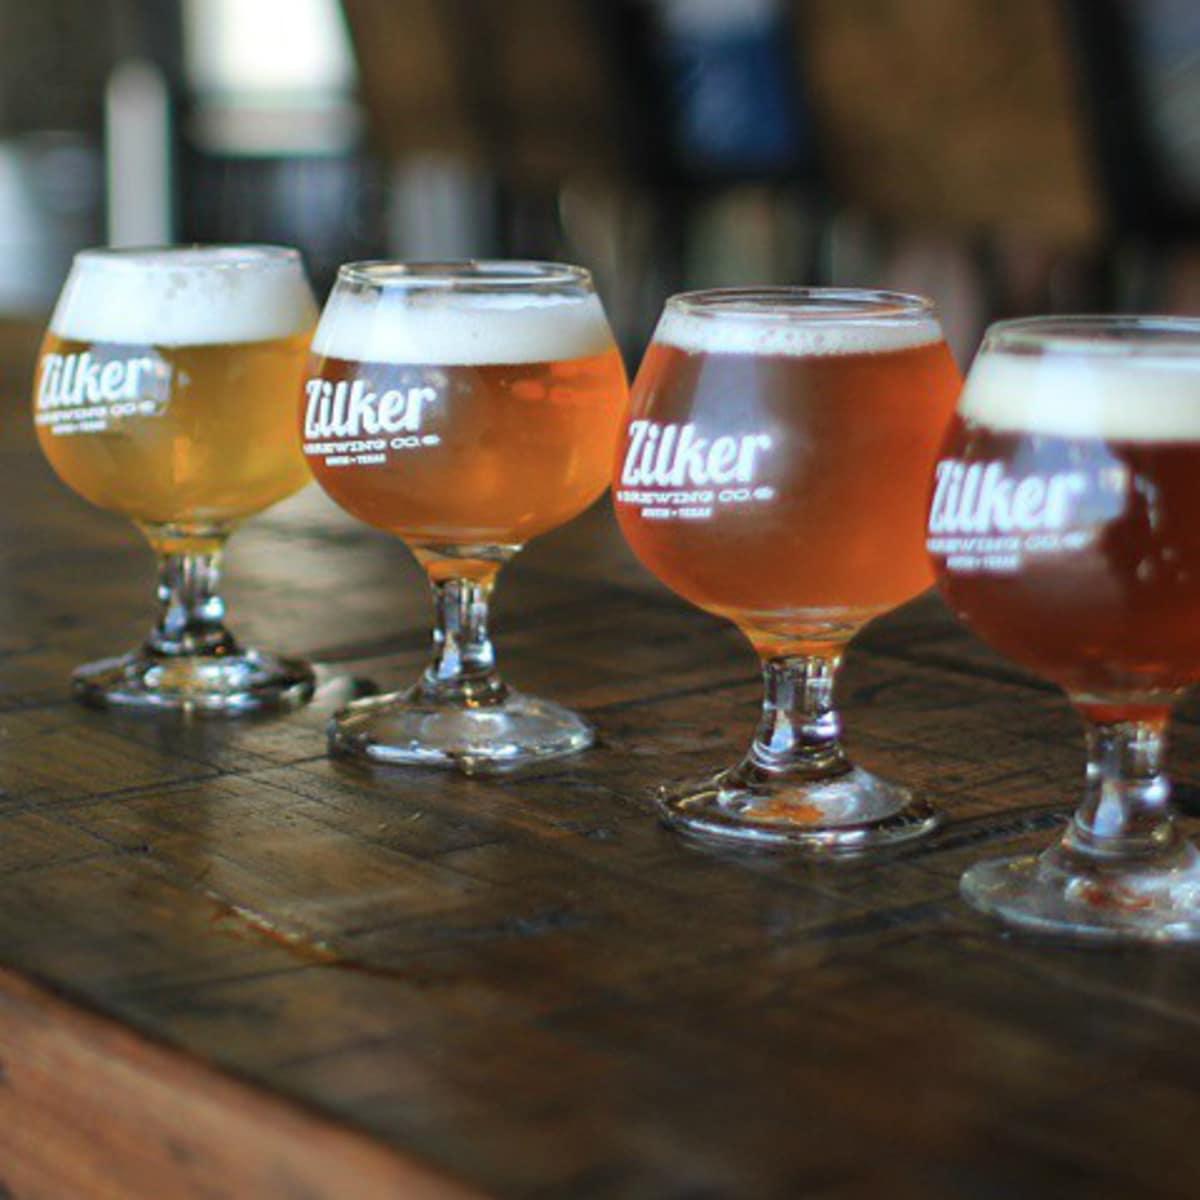 Zilker Brewing Company Austin brewery beer flight lineup